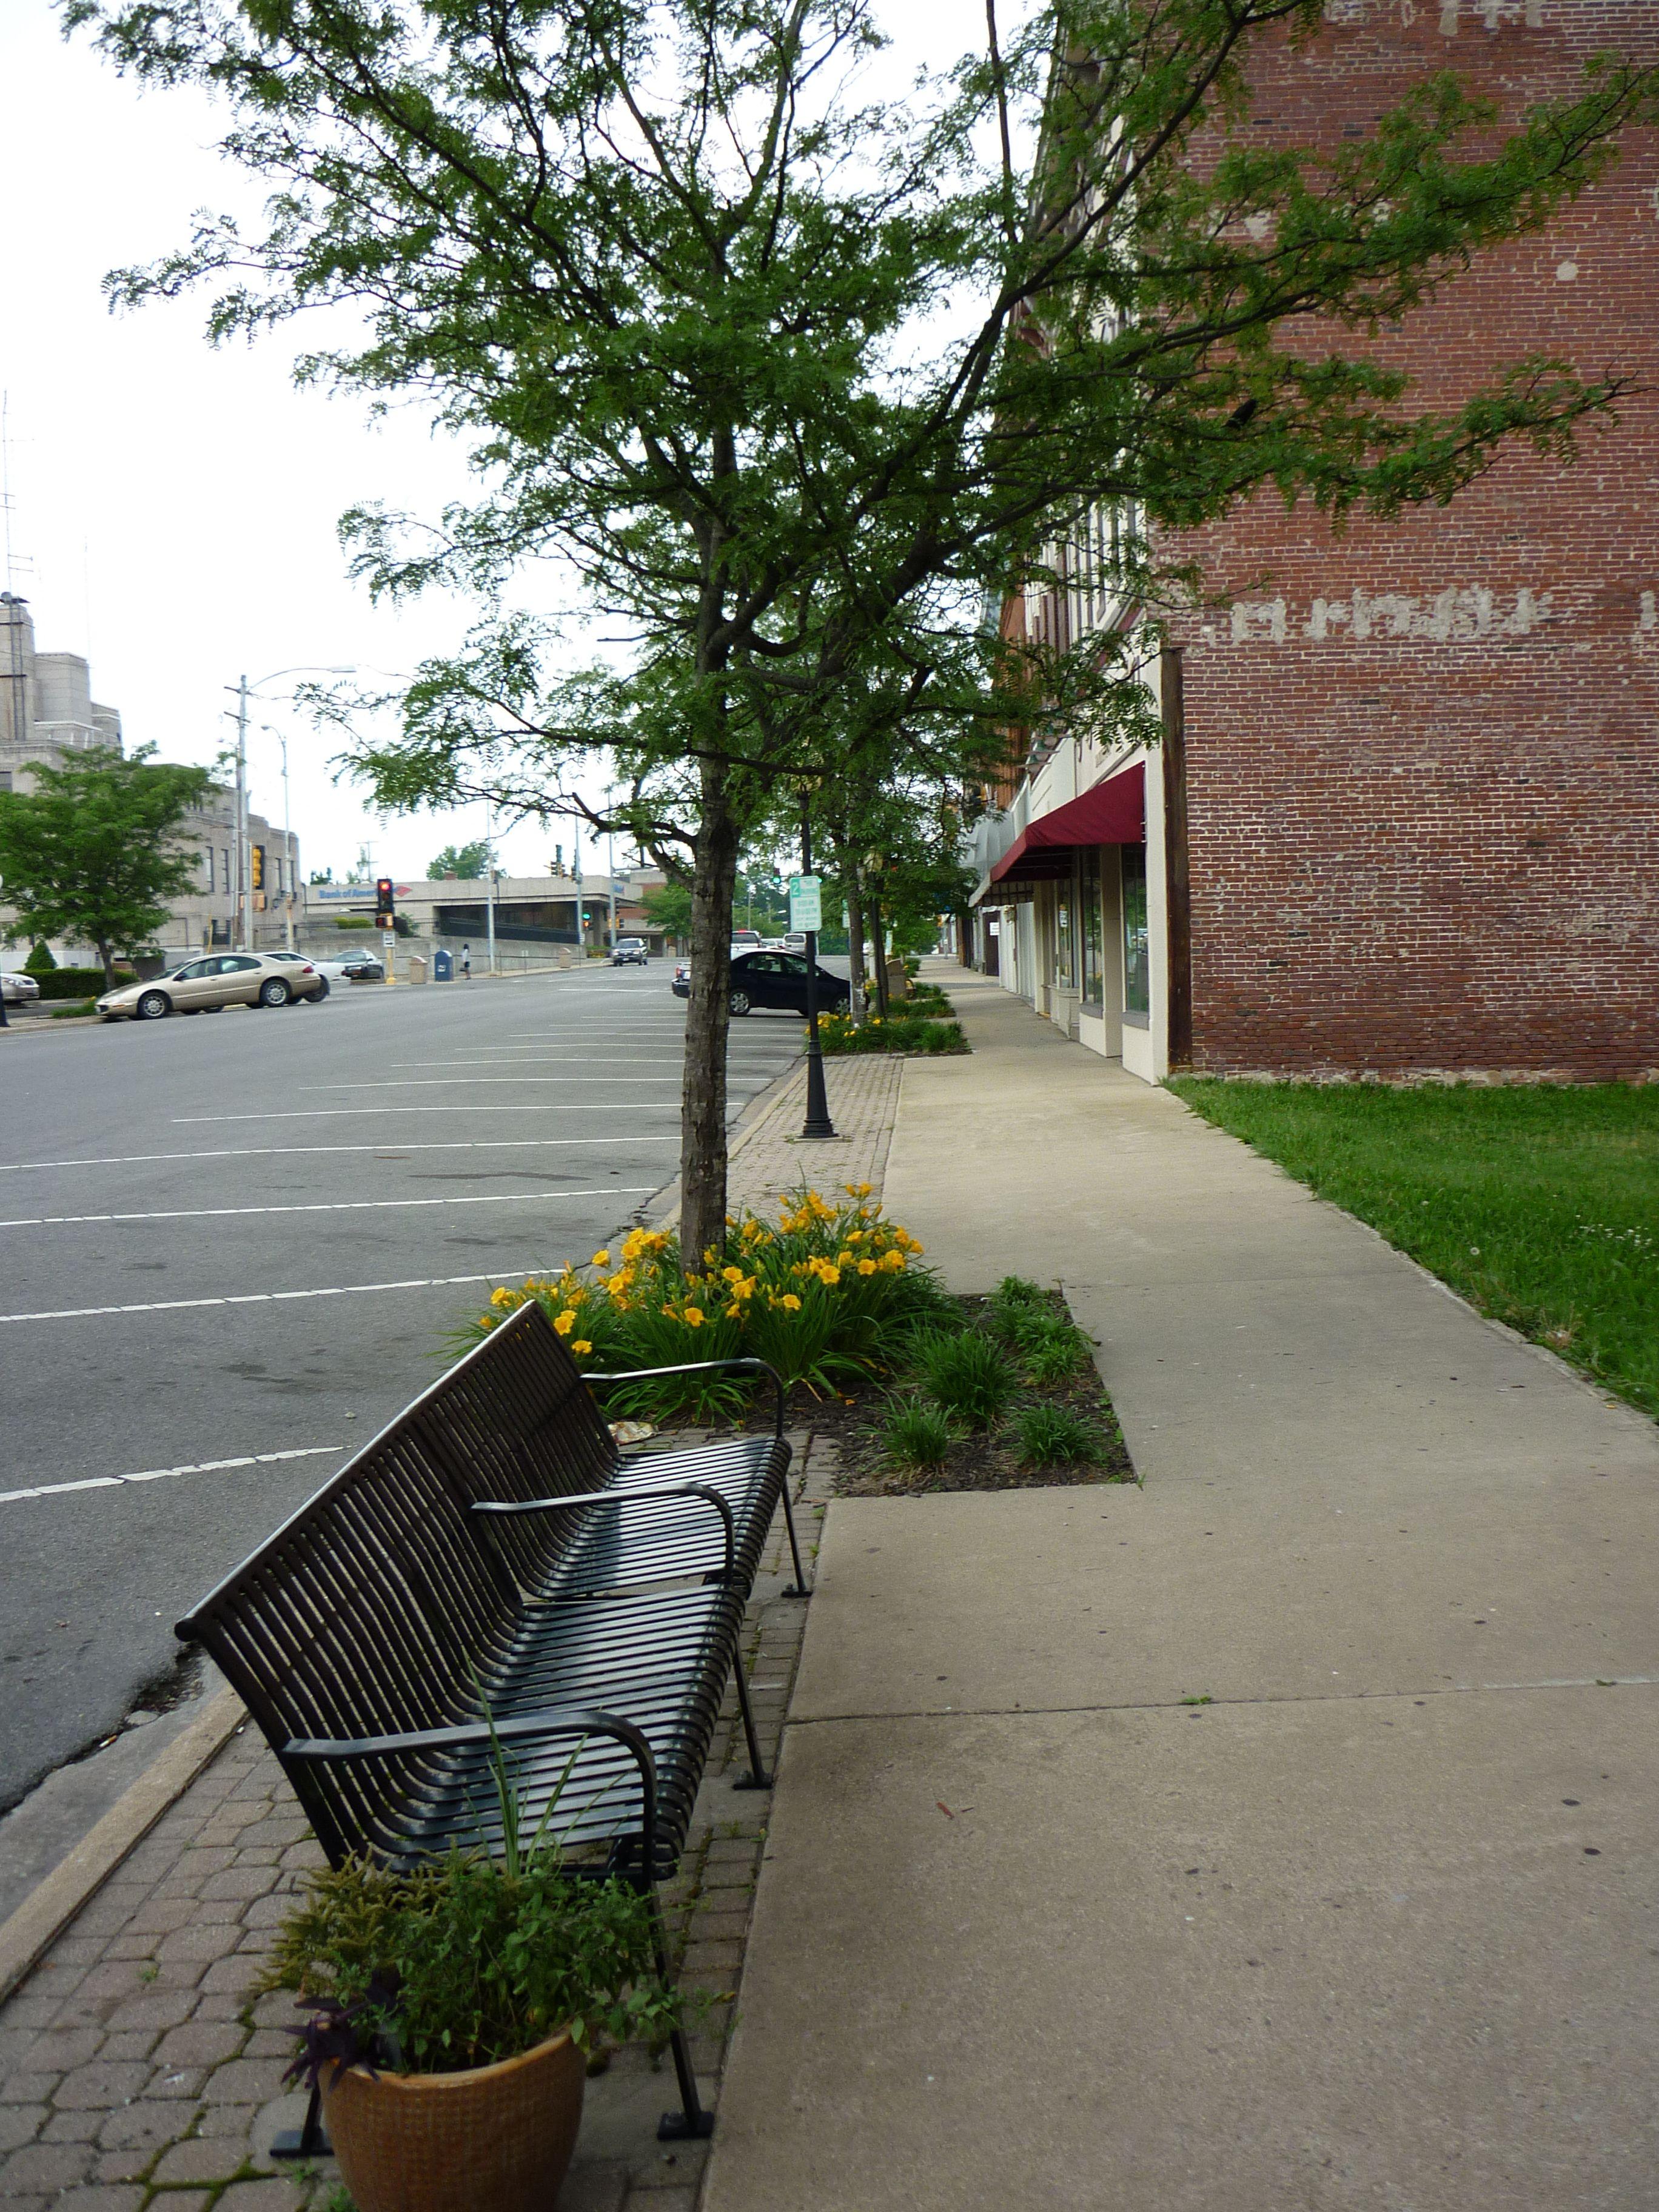 Streetscape To The North Of Hickory Click To Close: Mt.Vernon, IL / Jefferson County